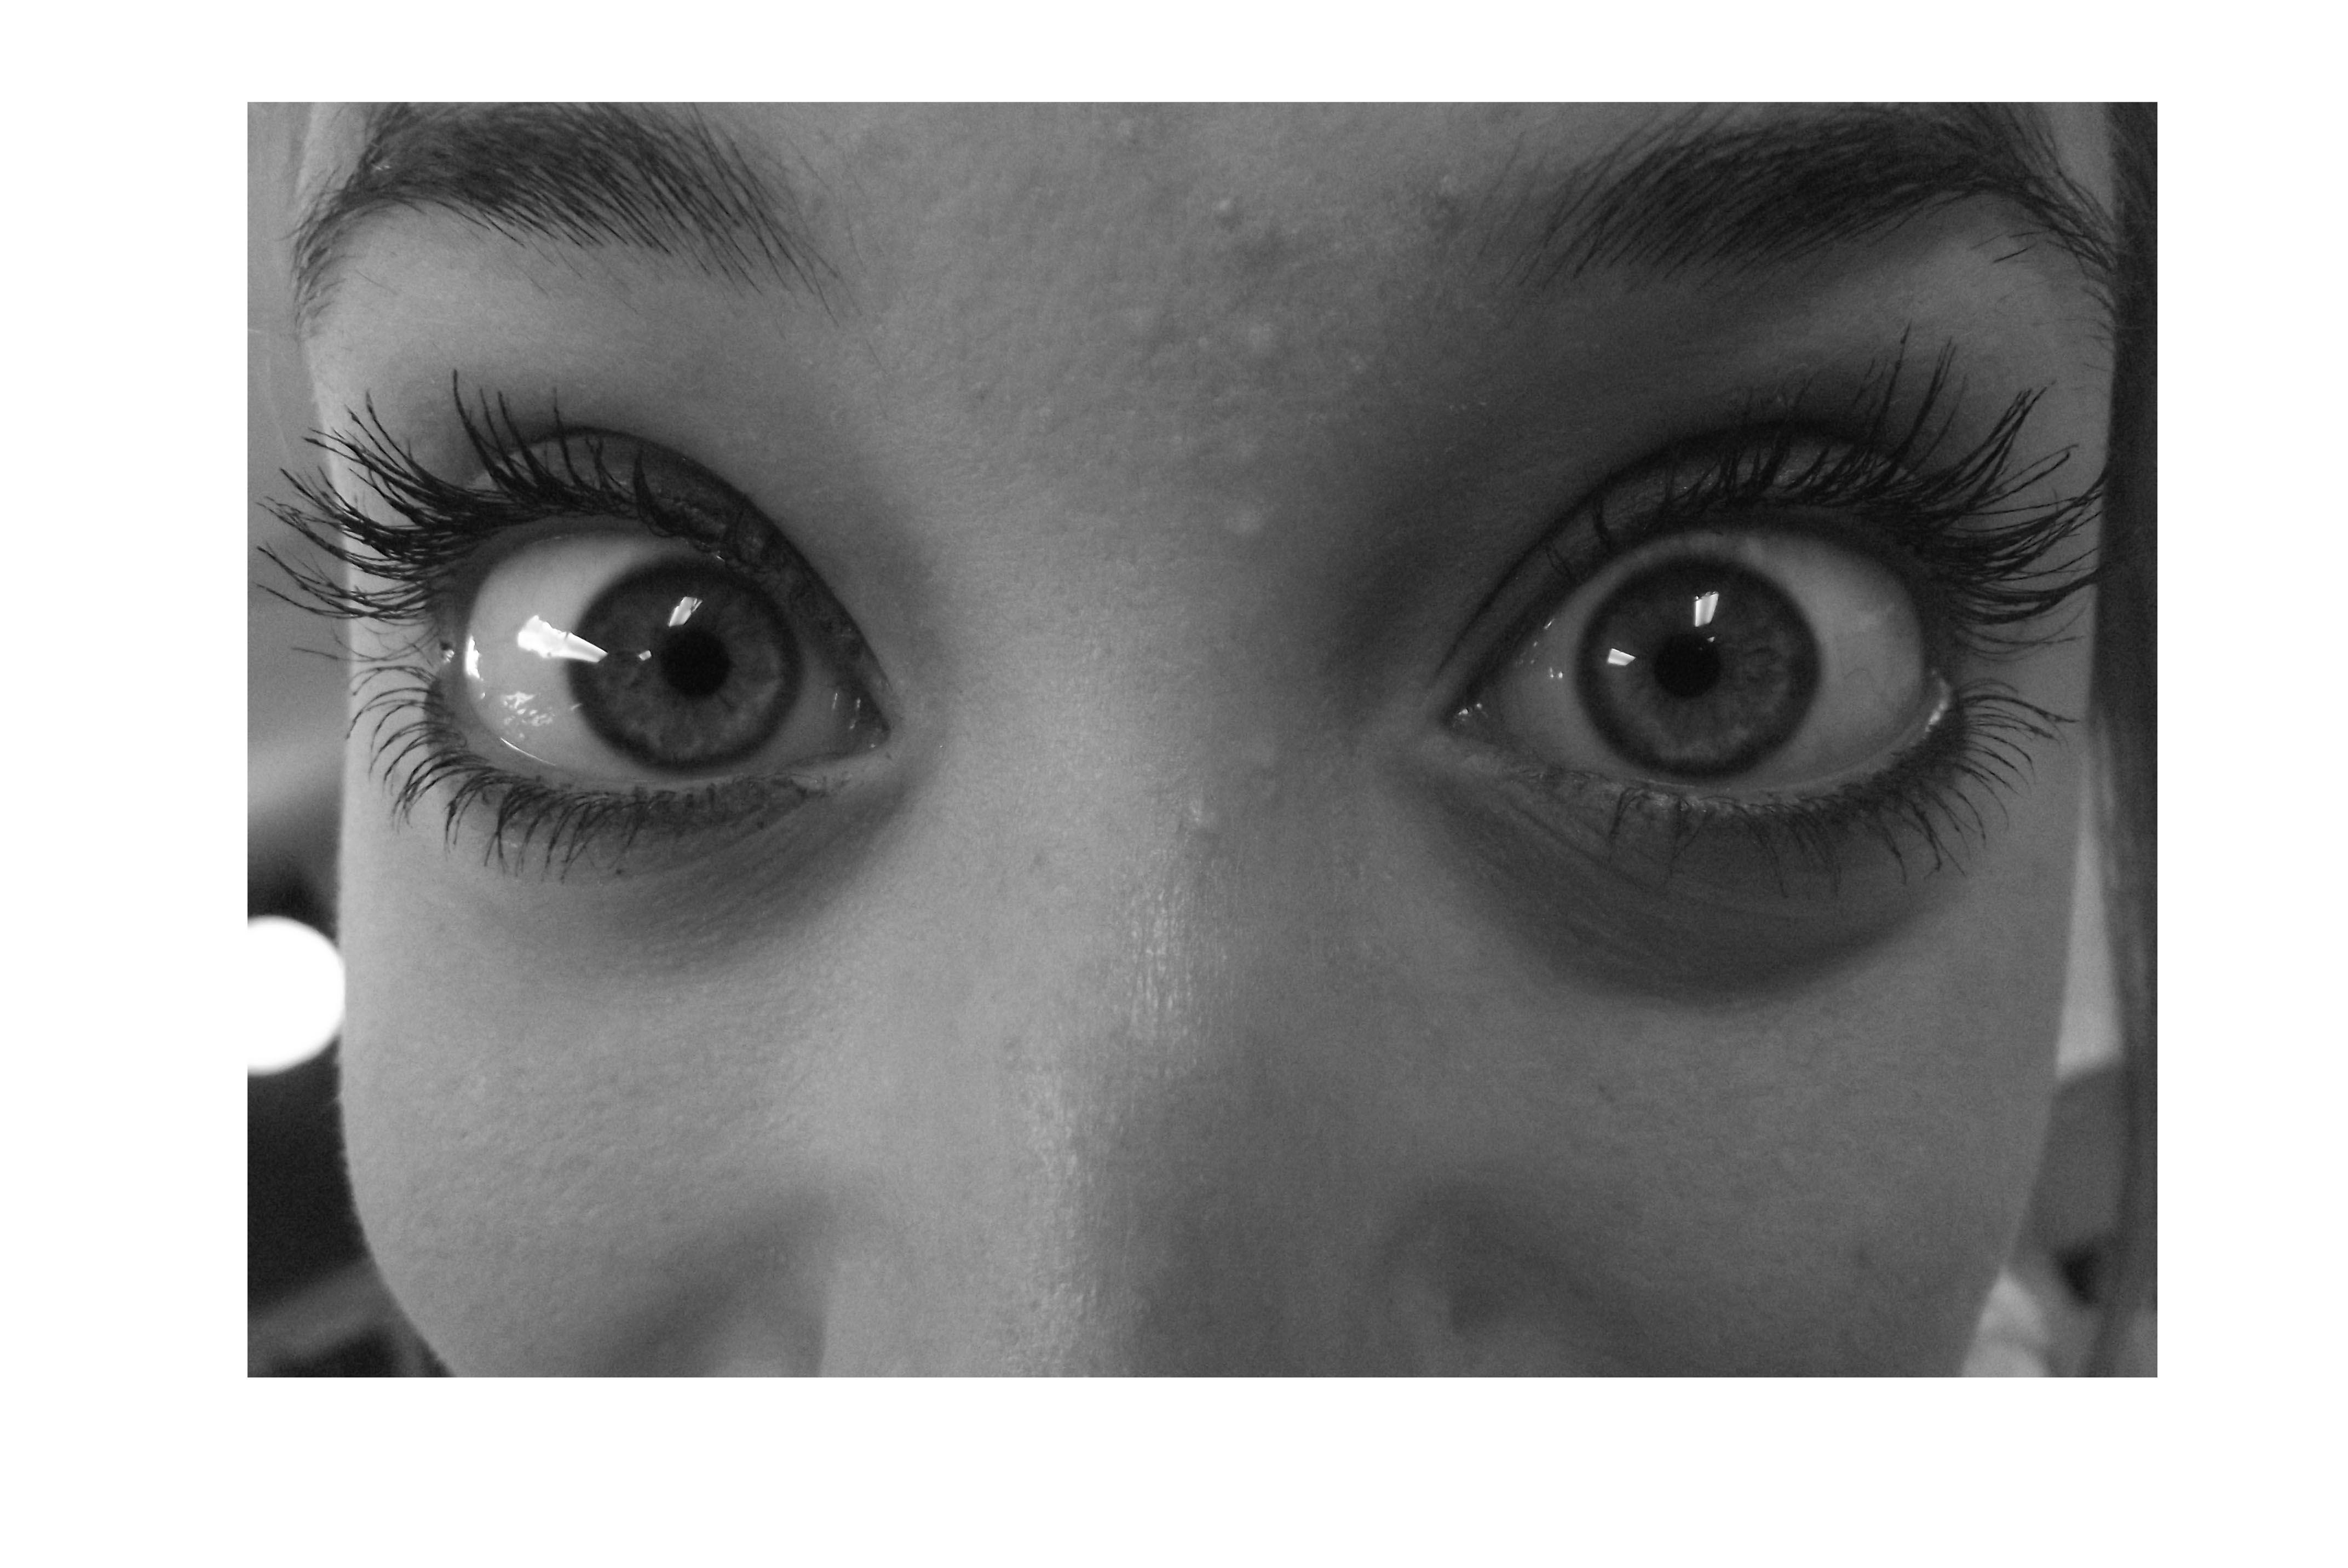 Favorite eye